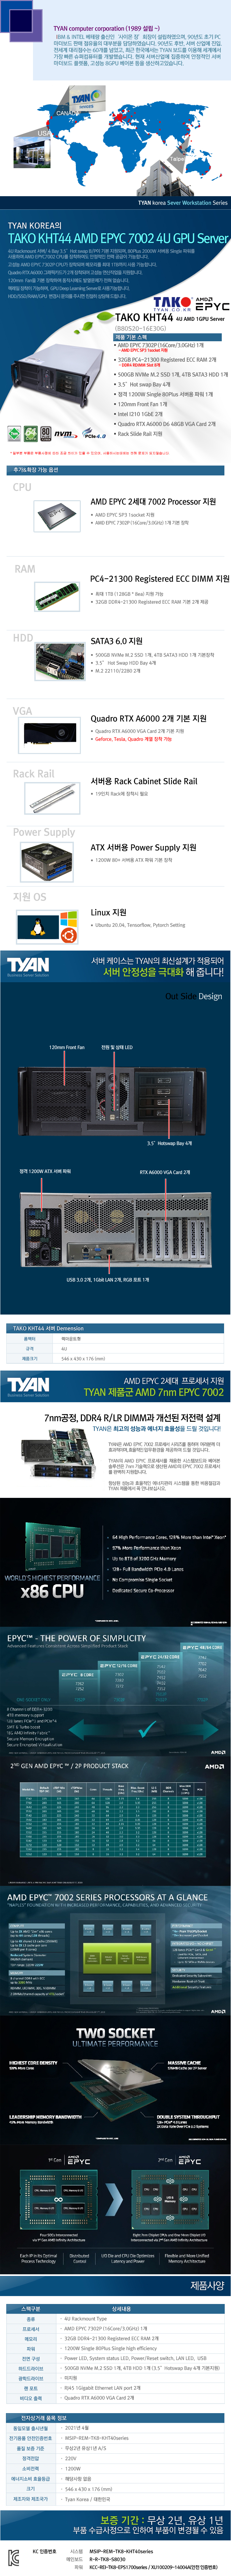 TYAN TAKO-KHT44-(B80S12-16E30Q)-RTX A6000 2GPU (64GB, M2 500GB + 4TB)